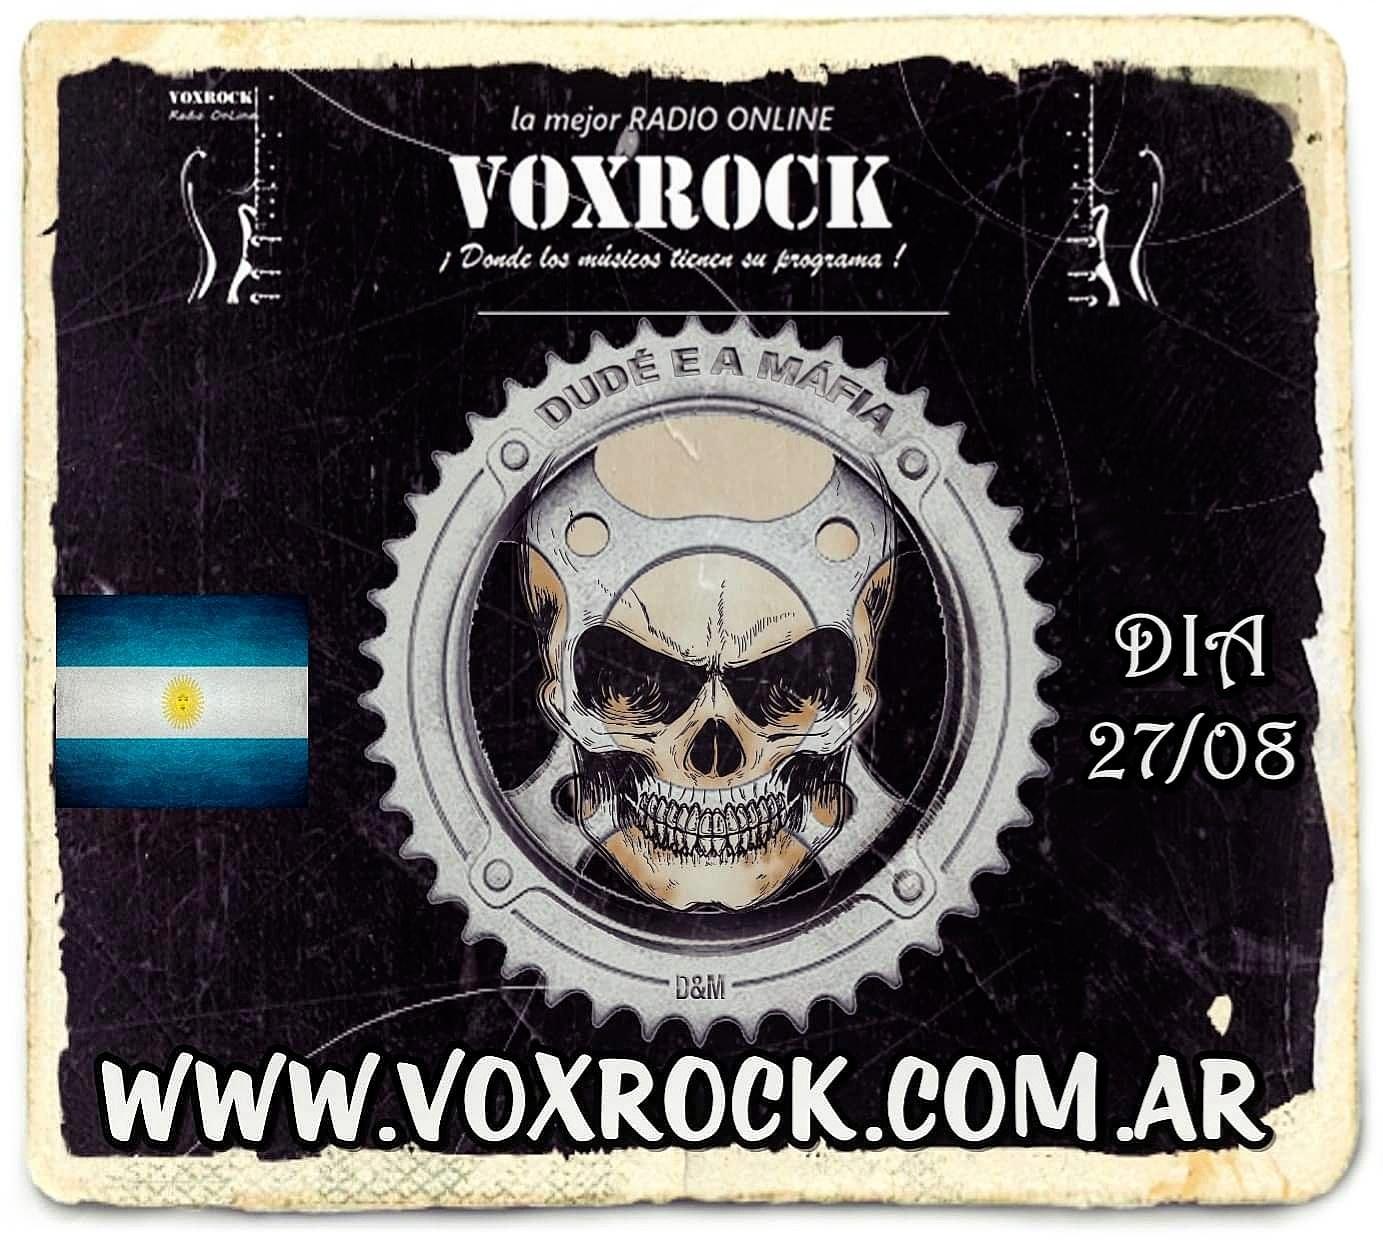 dude e a mafia vox rock argentina